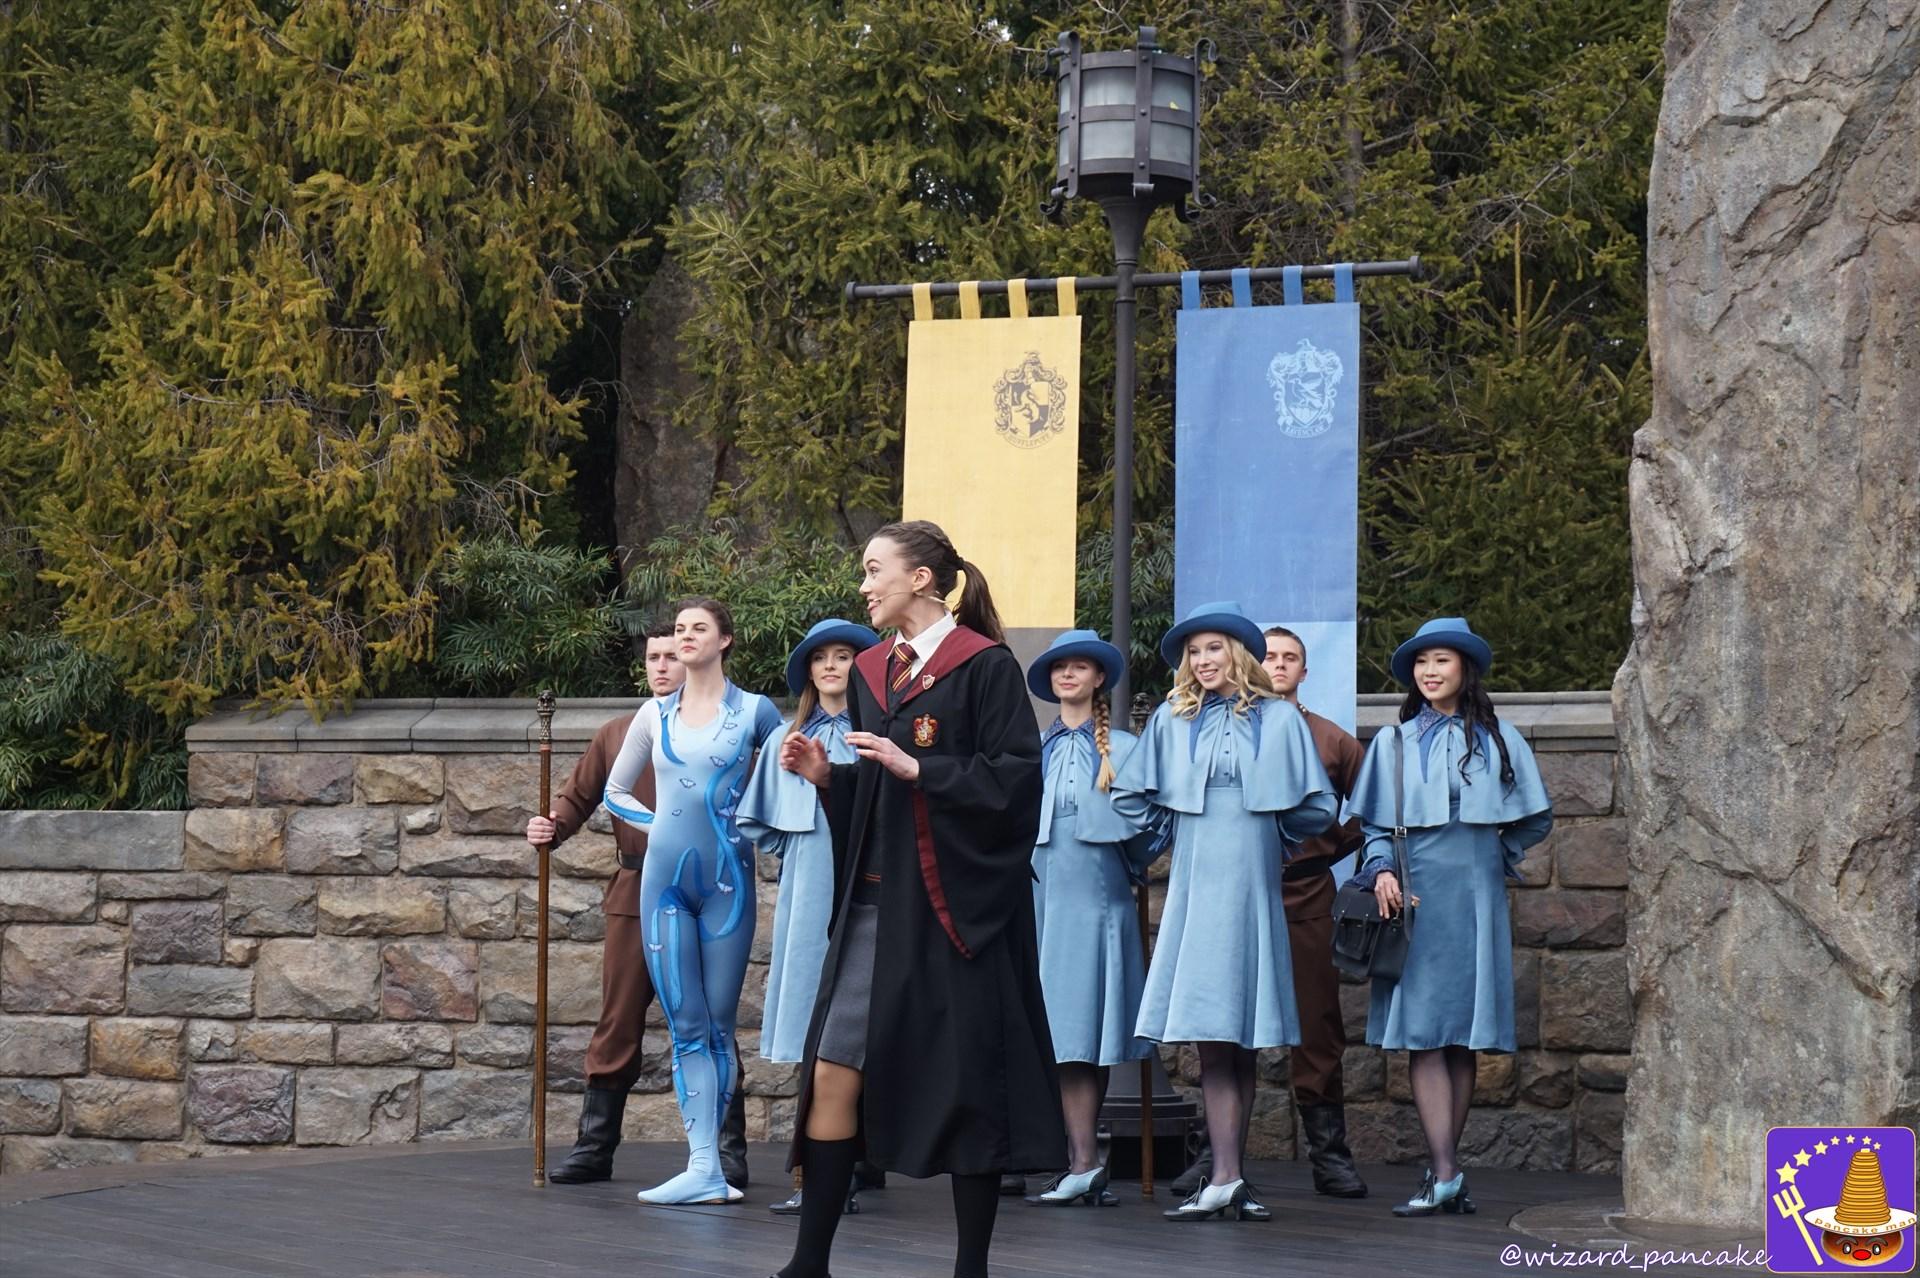 USJハリポタエリア祝5周年 大魔法祭♪『トライウィザード・スピリット・ラリー』2019新バージョン ホグズミード村の新ショー